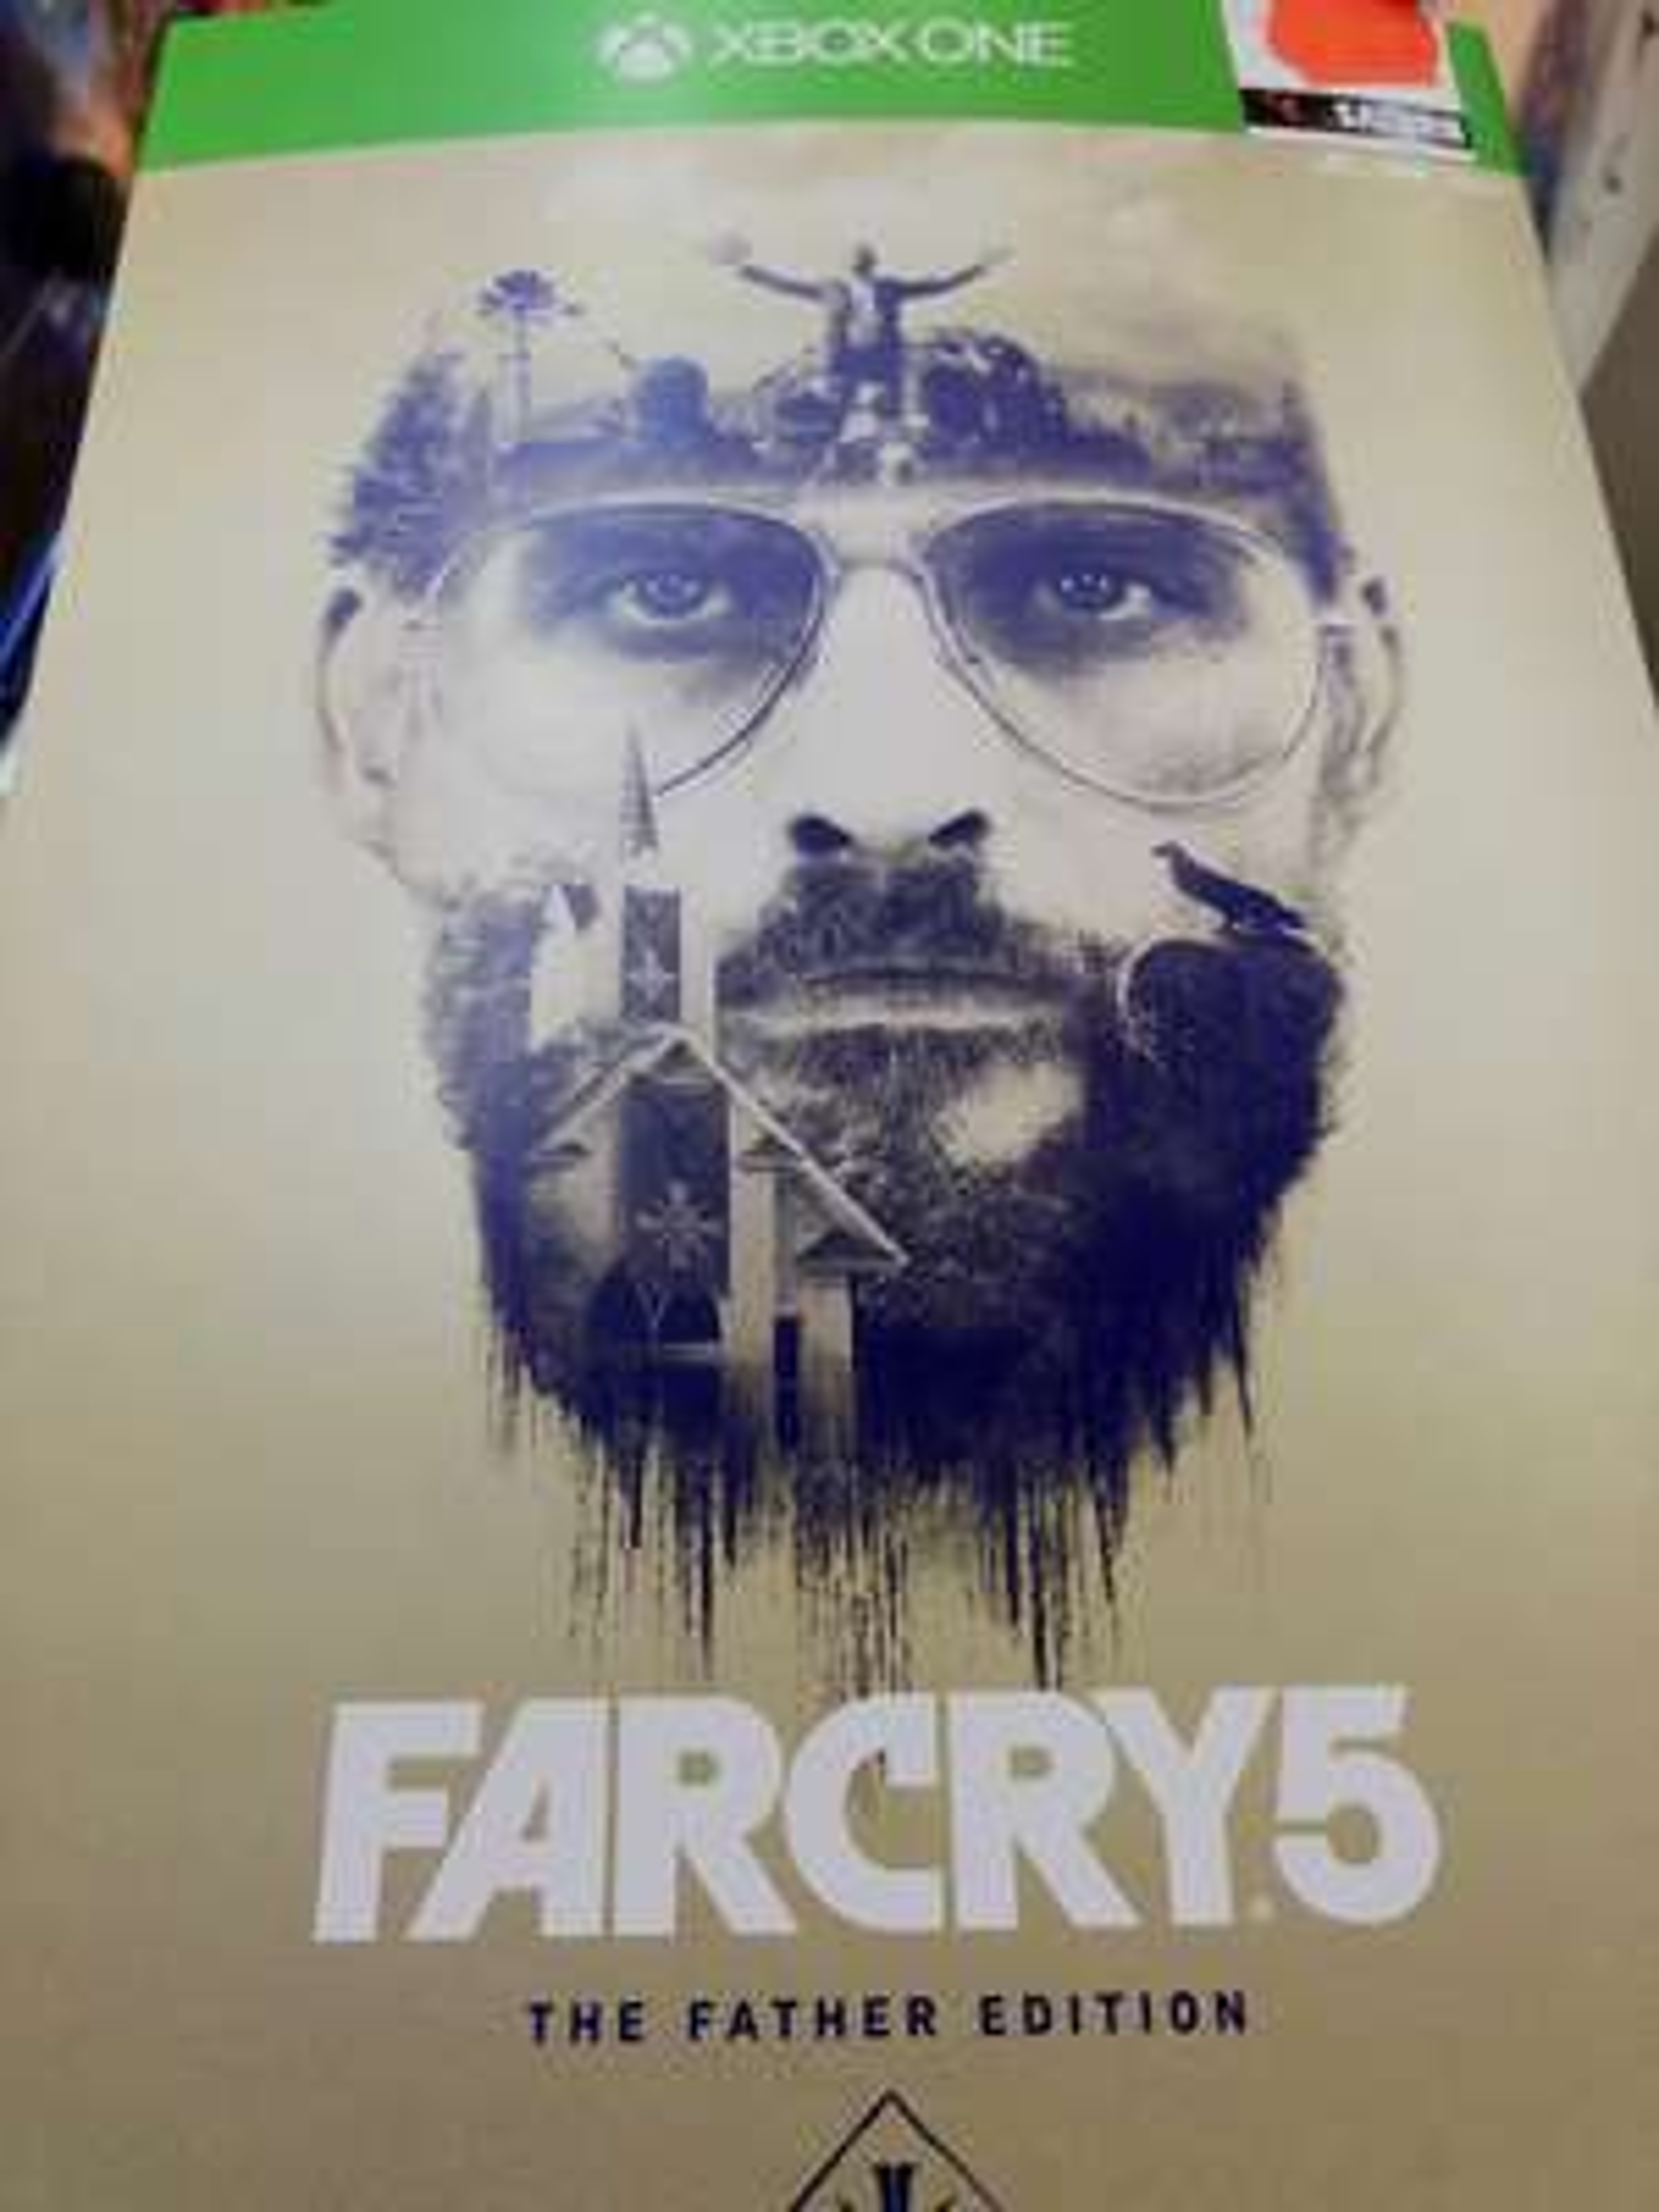 Far Cry 5 - The Father Edition - [Xbox One] für 50€ im Saturn Dortmund - City / Lokal